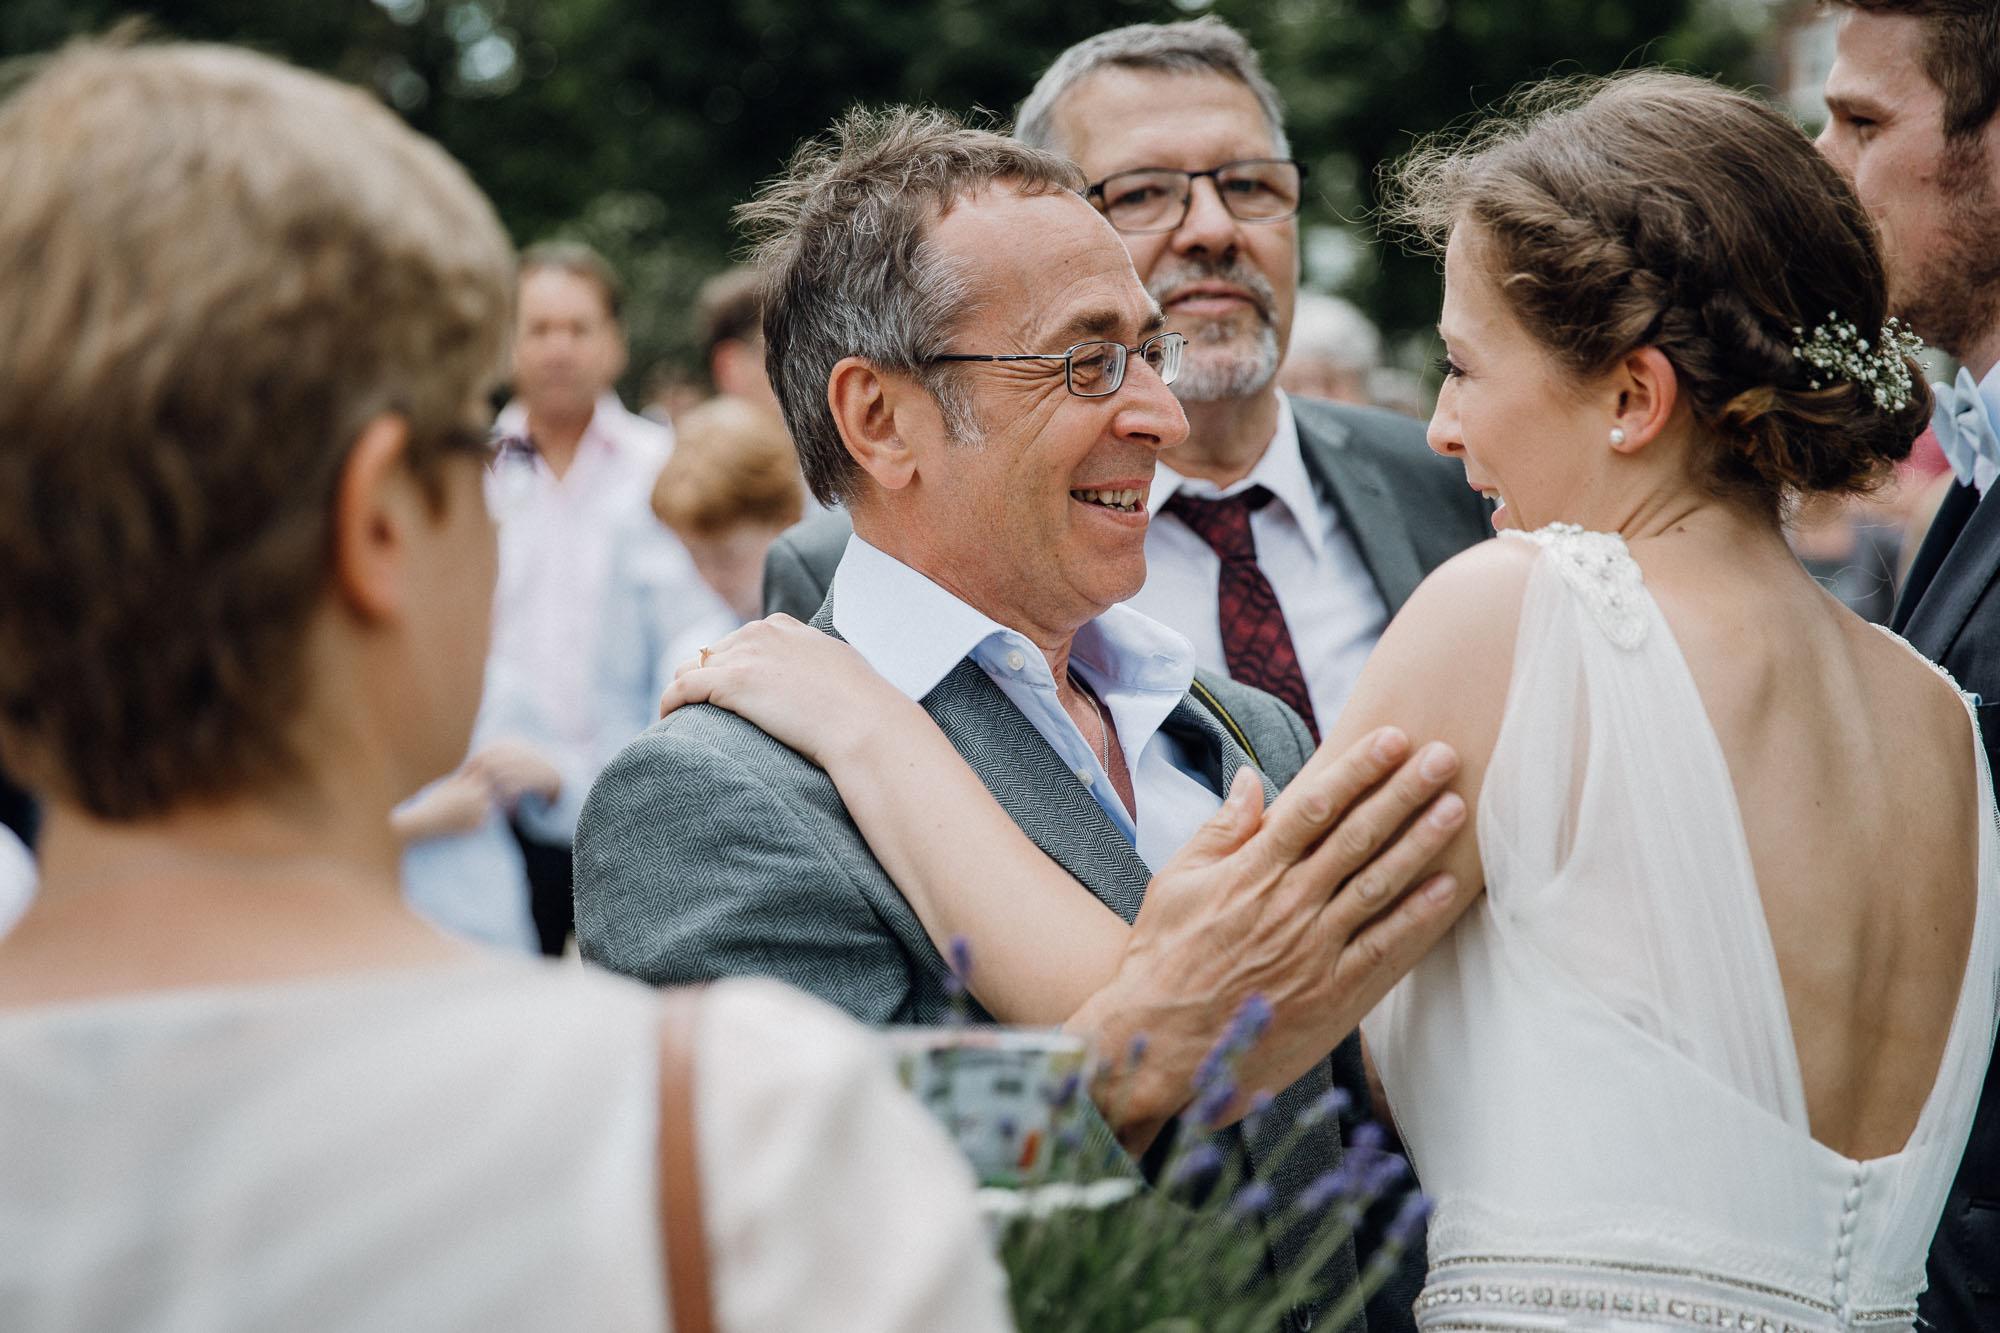 raissa simon photography destination wedding munich black forest offenburg 094 - Claudia + Christoph